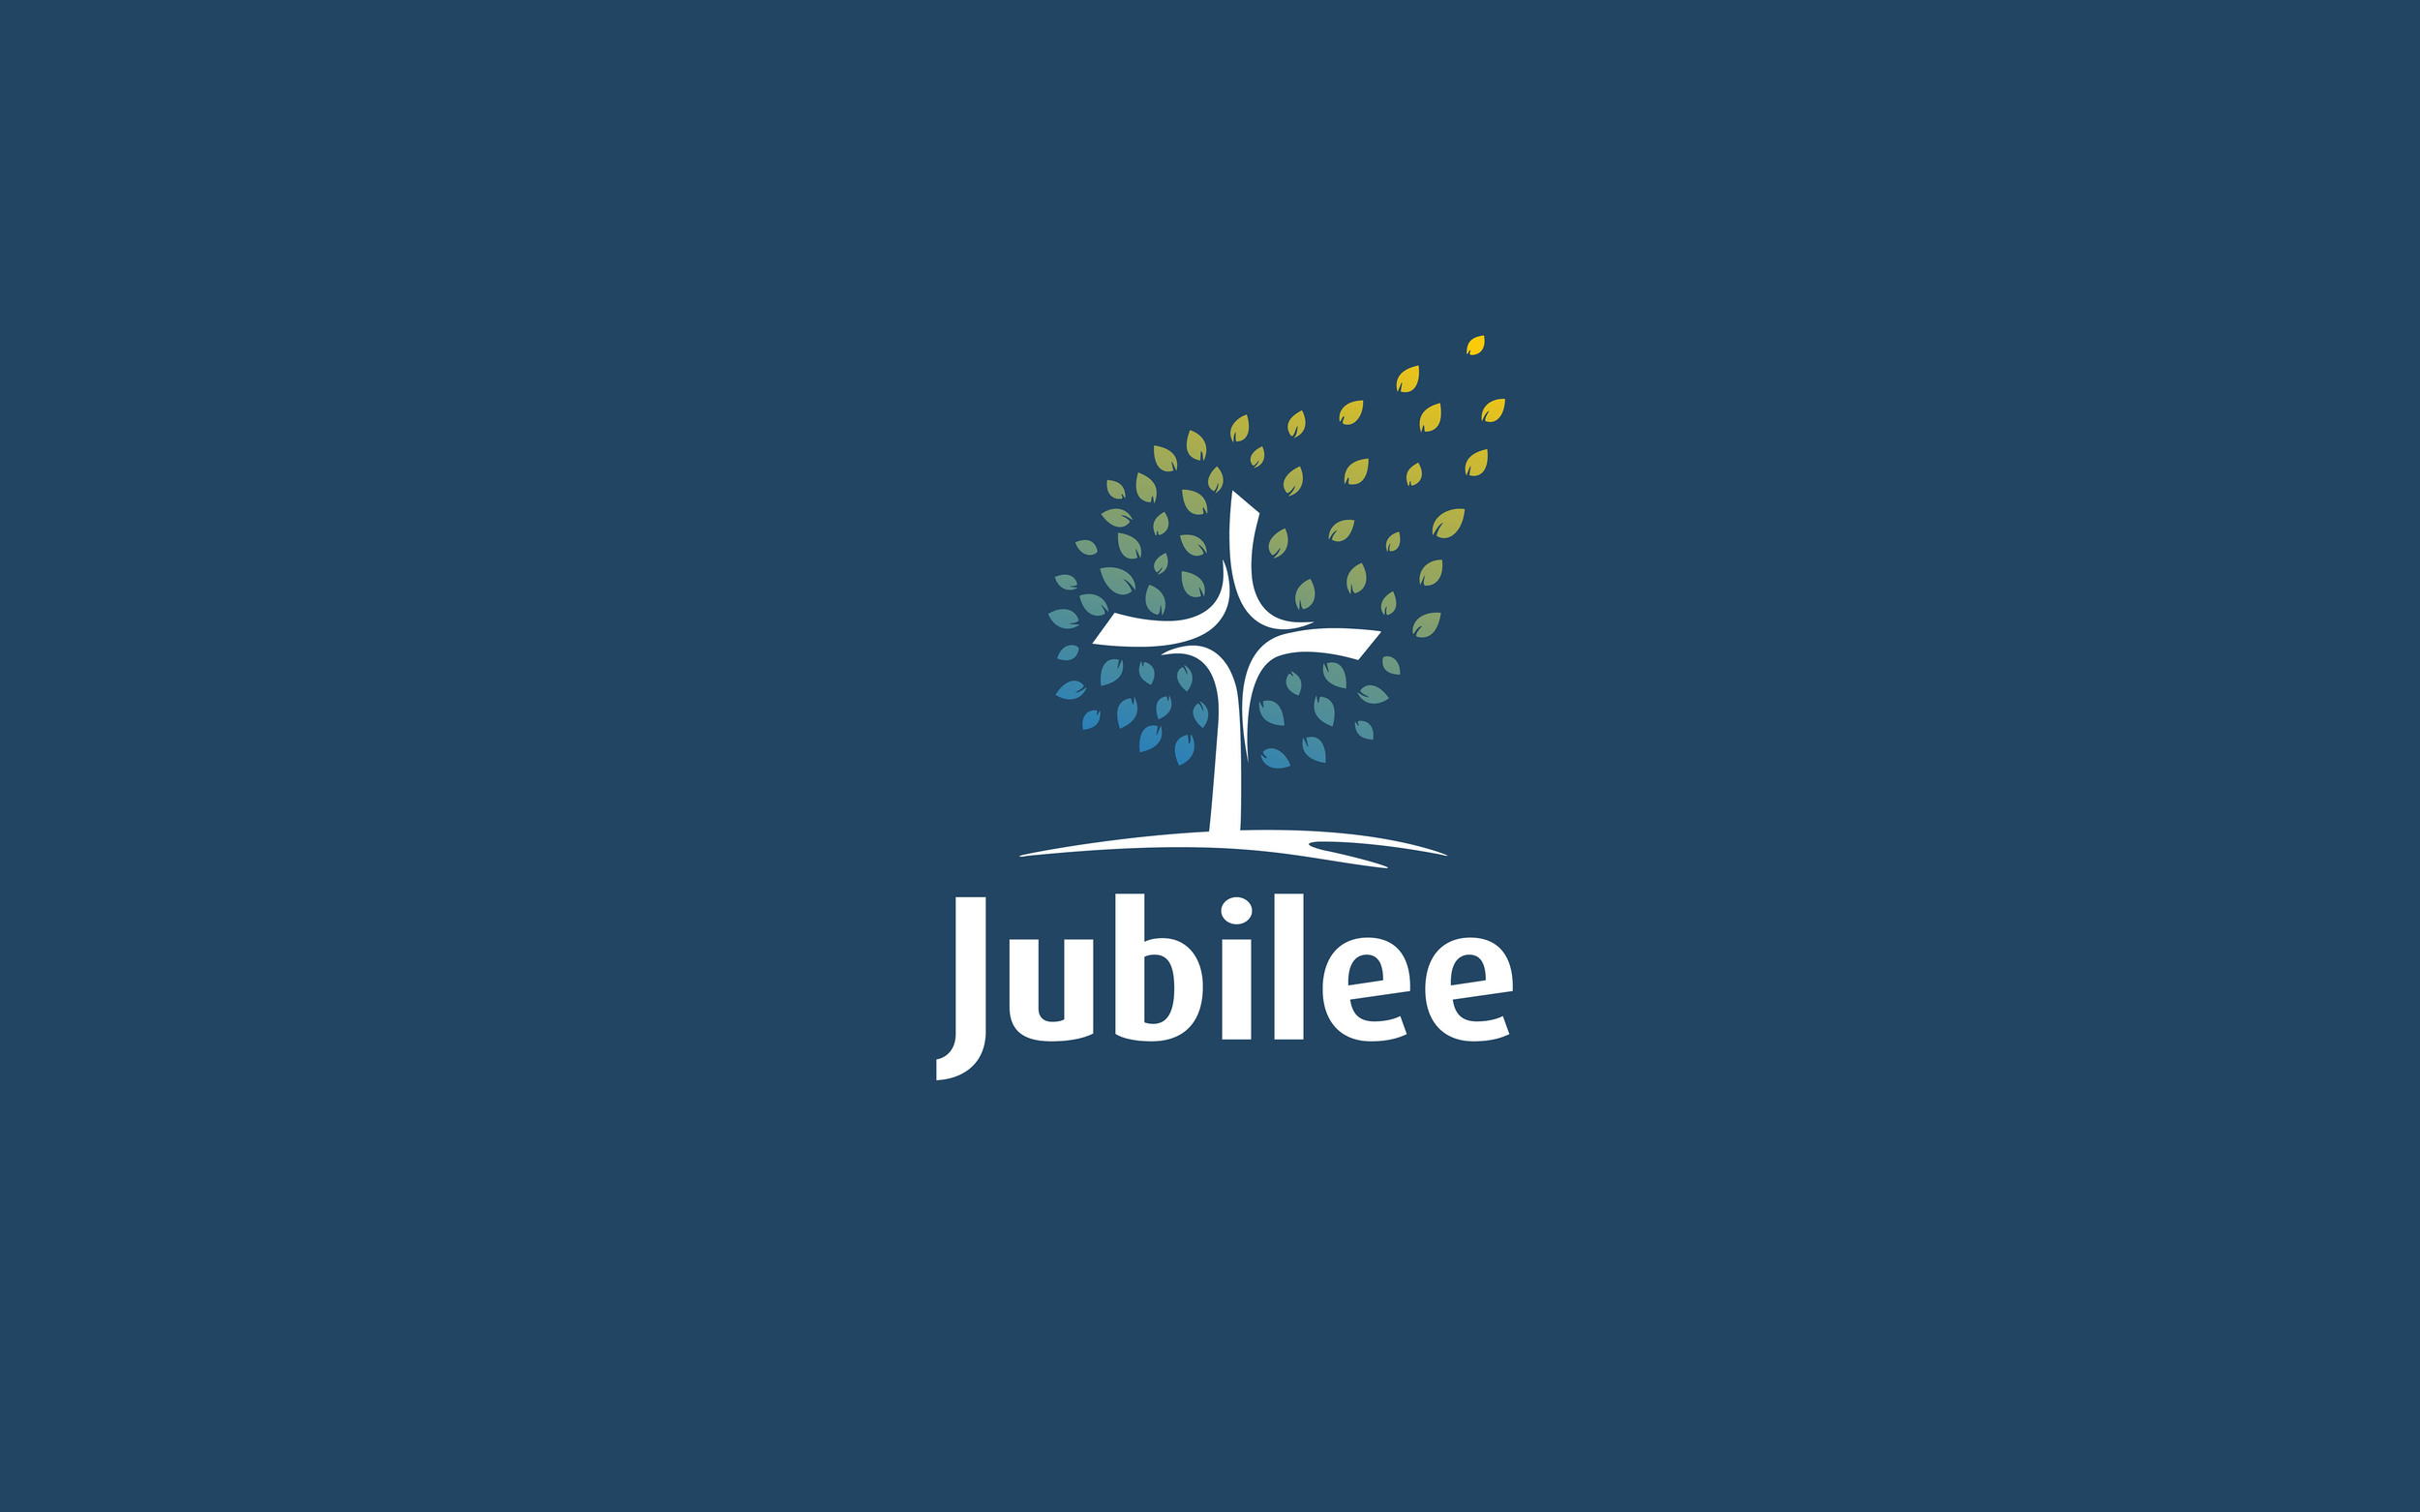 Why Jubilee?